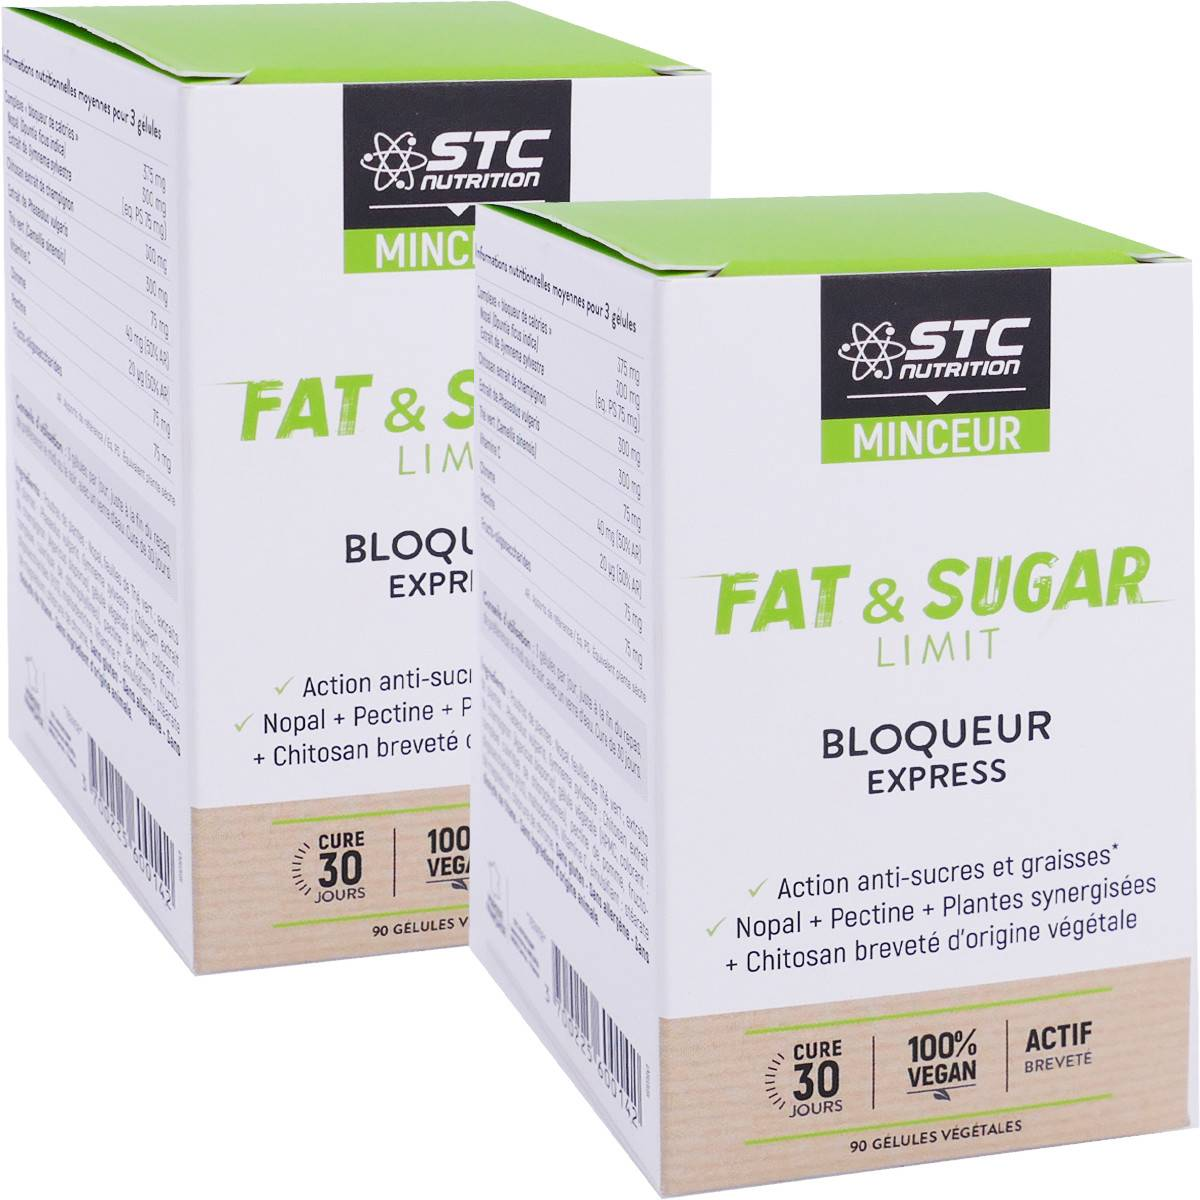 STC NUTRITION Pack promo stc minceur fat & sugar 2x 90 gelules